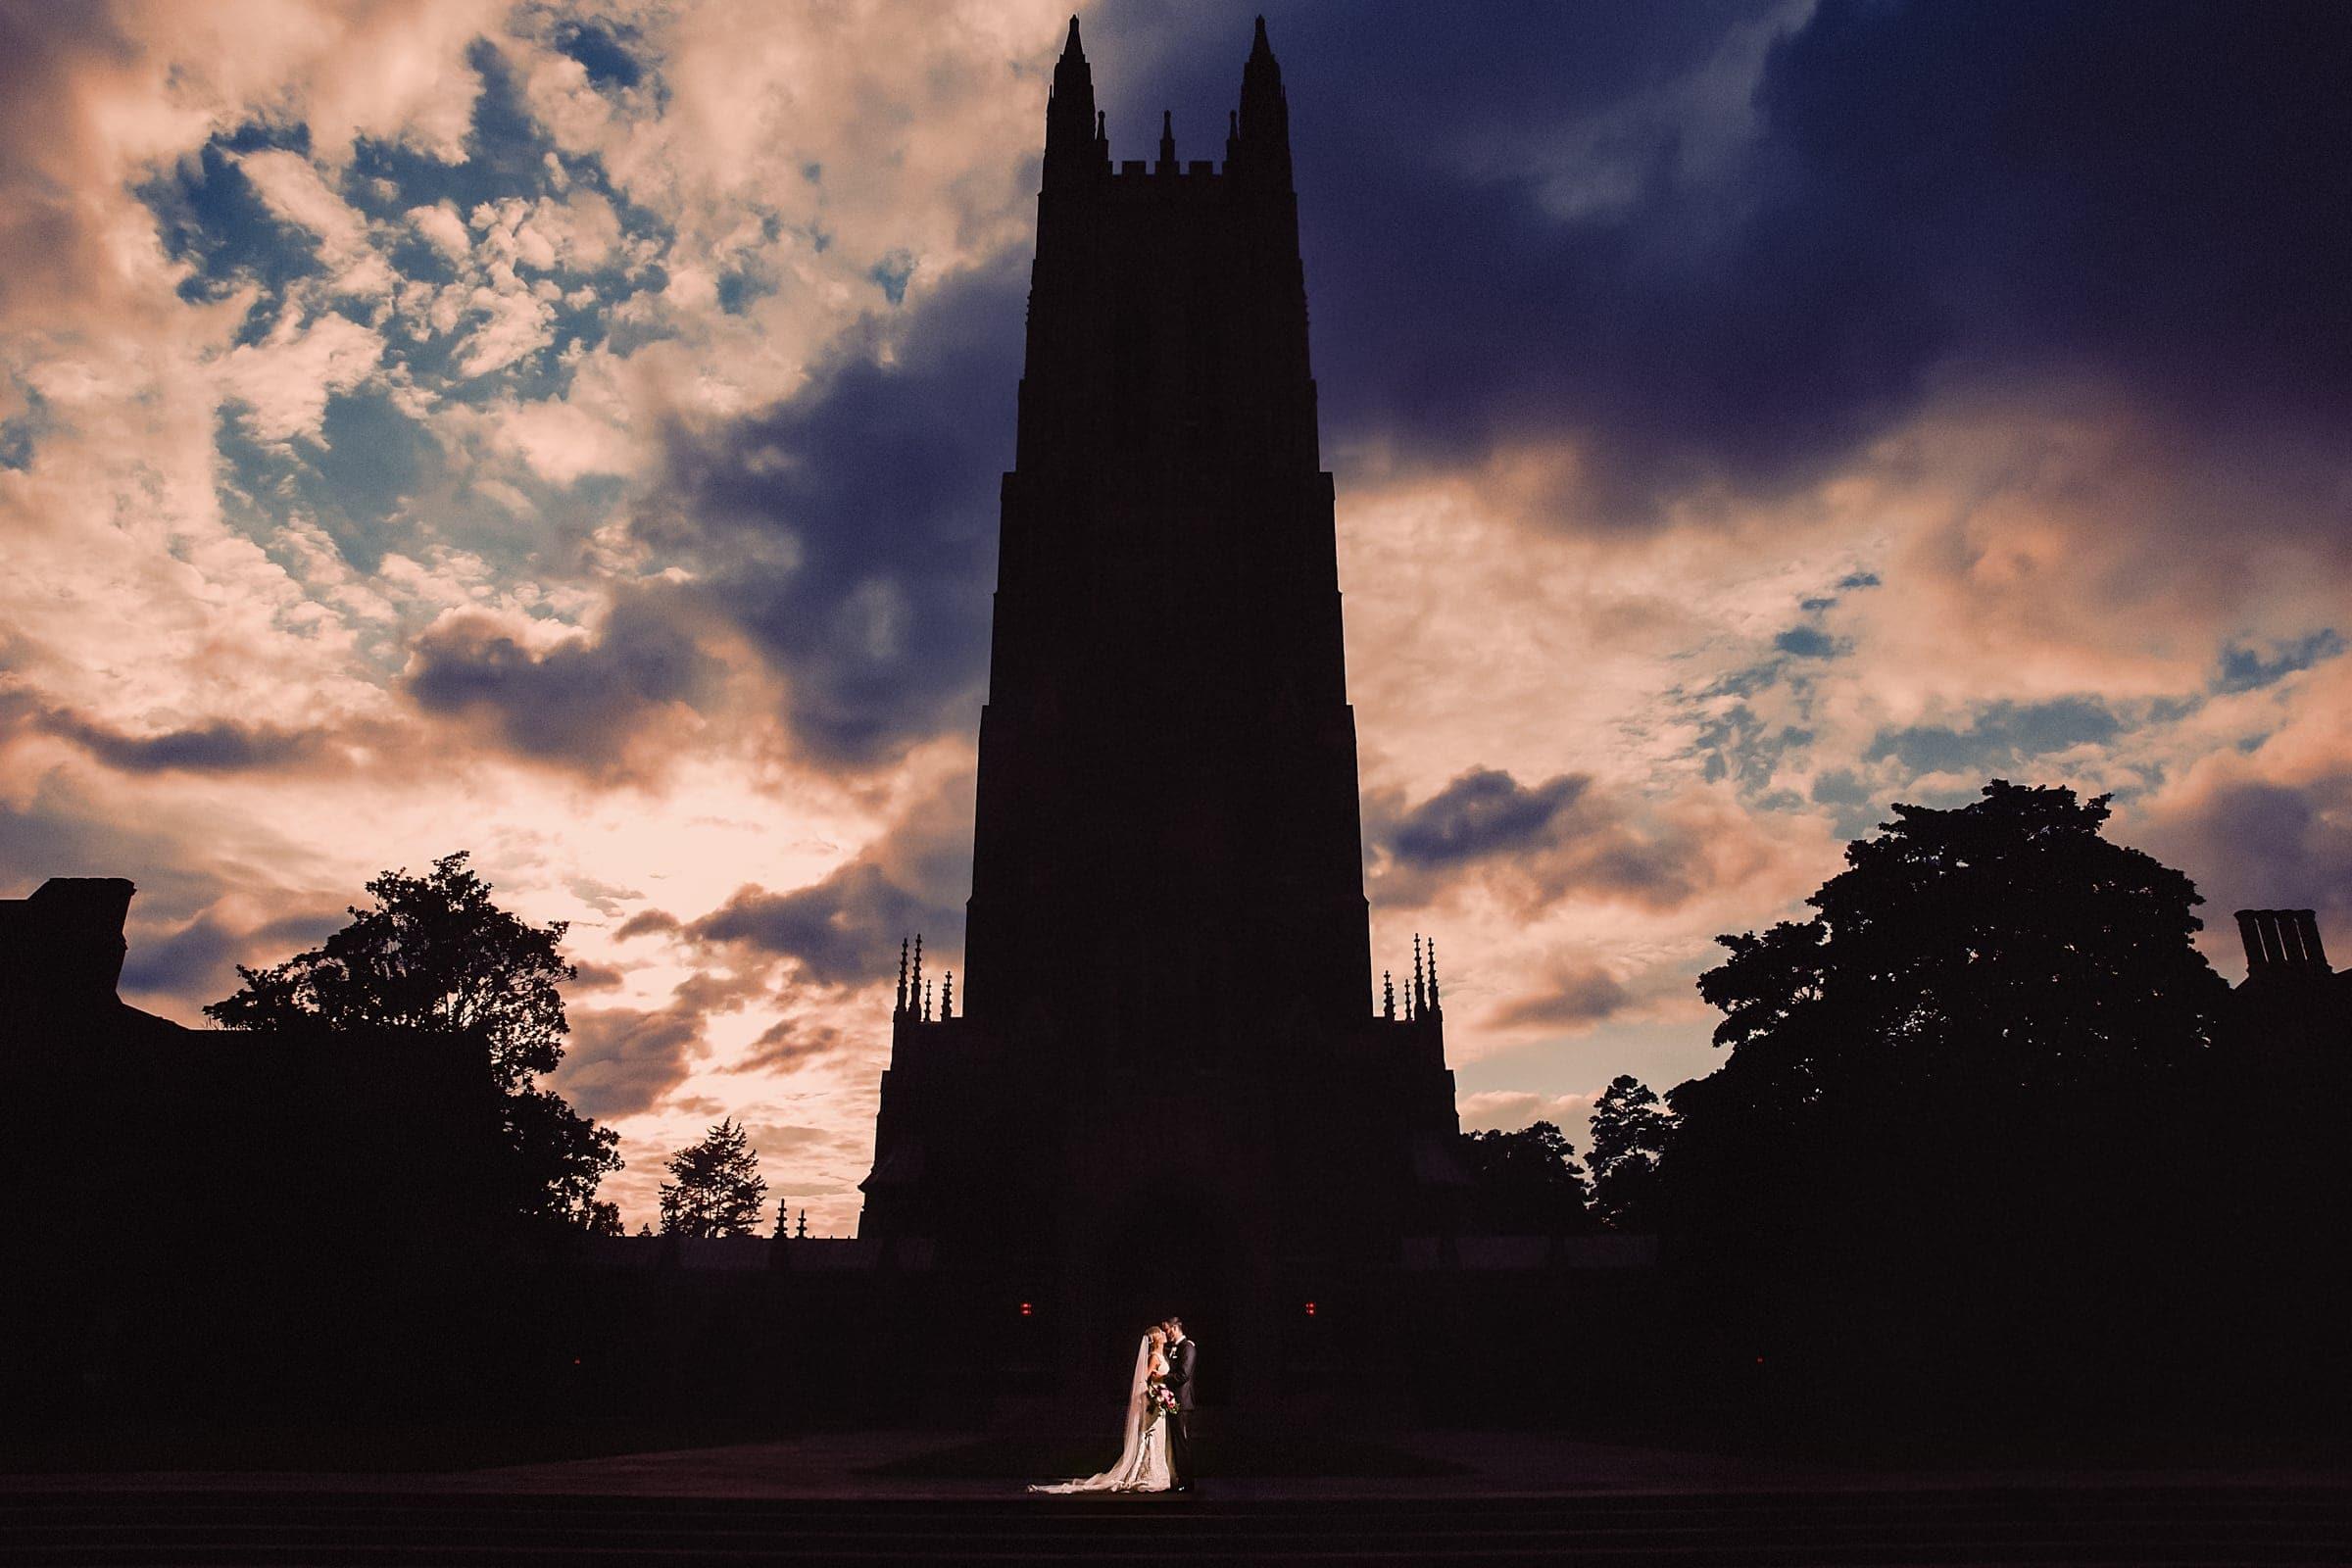 Duke Chapel Weddings - Couple in Silhouette of Chapel with Dramatic Sky by Joe Payne